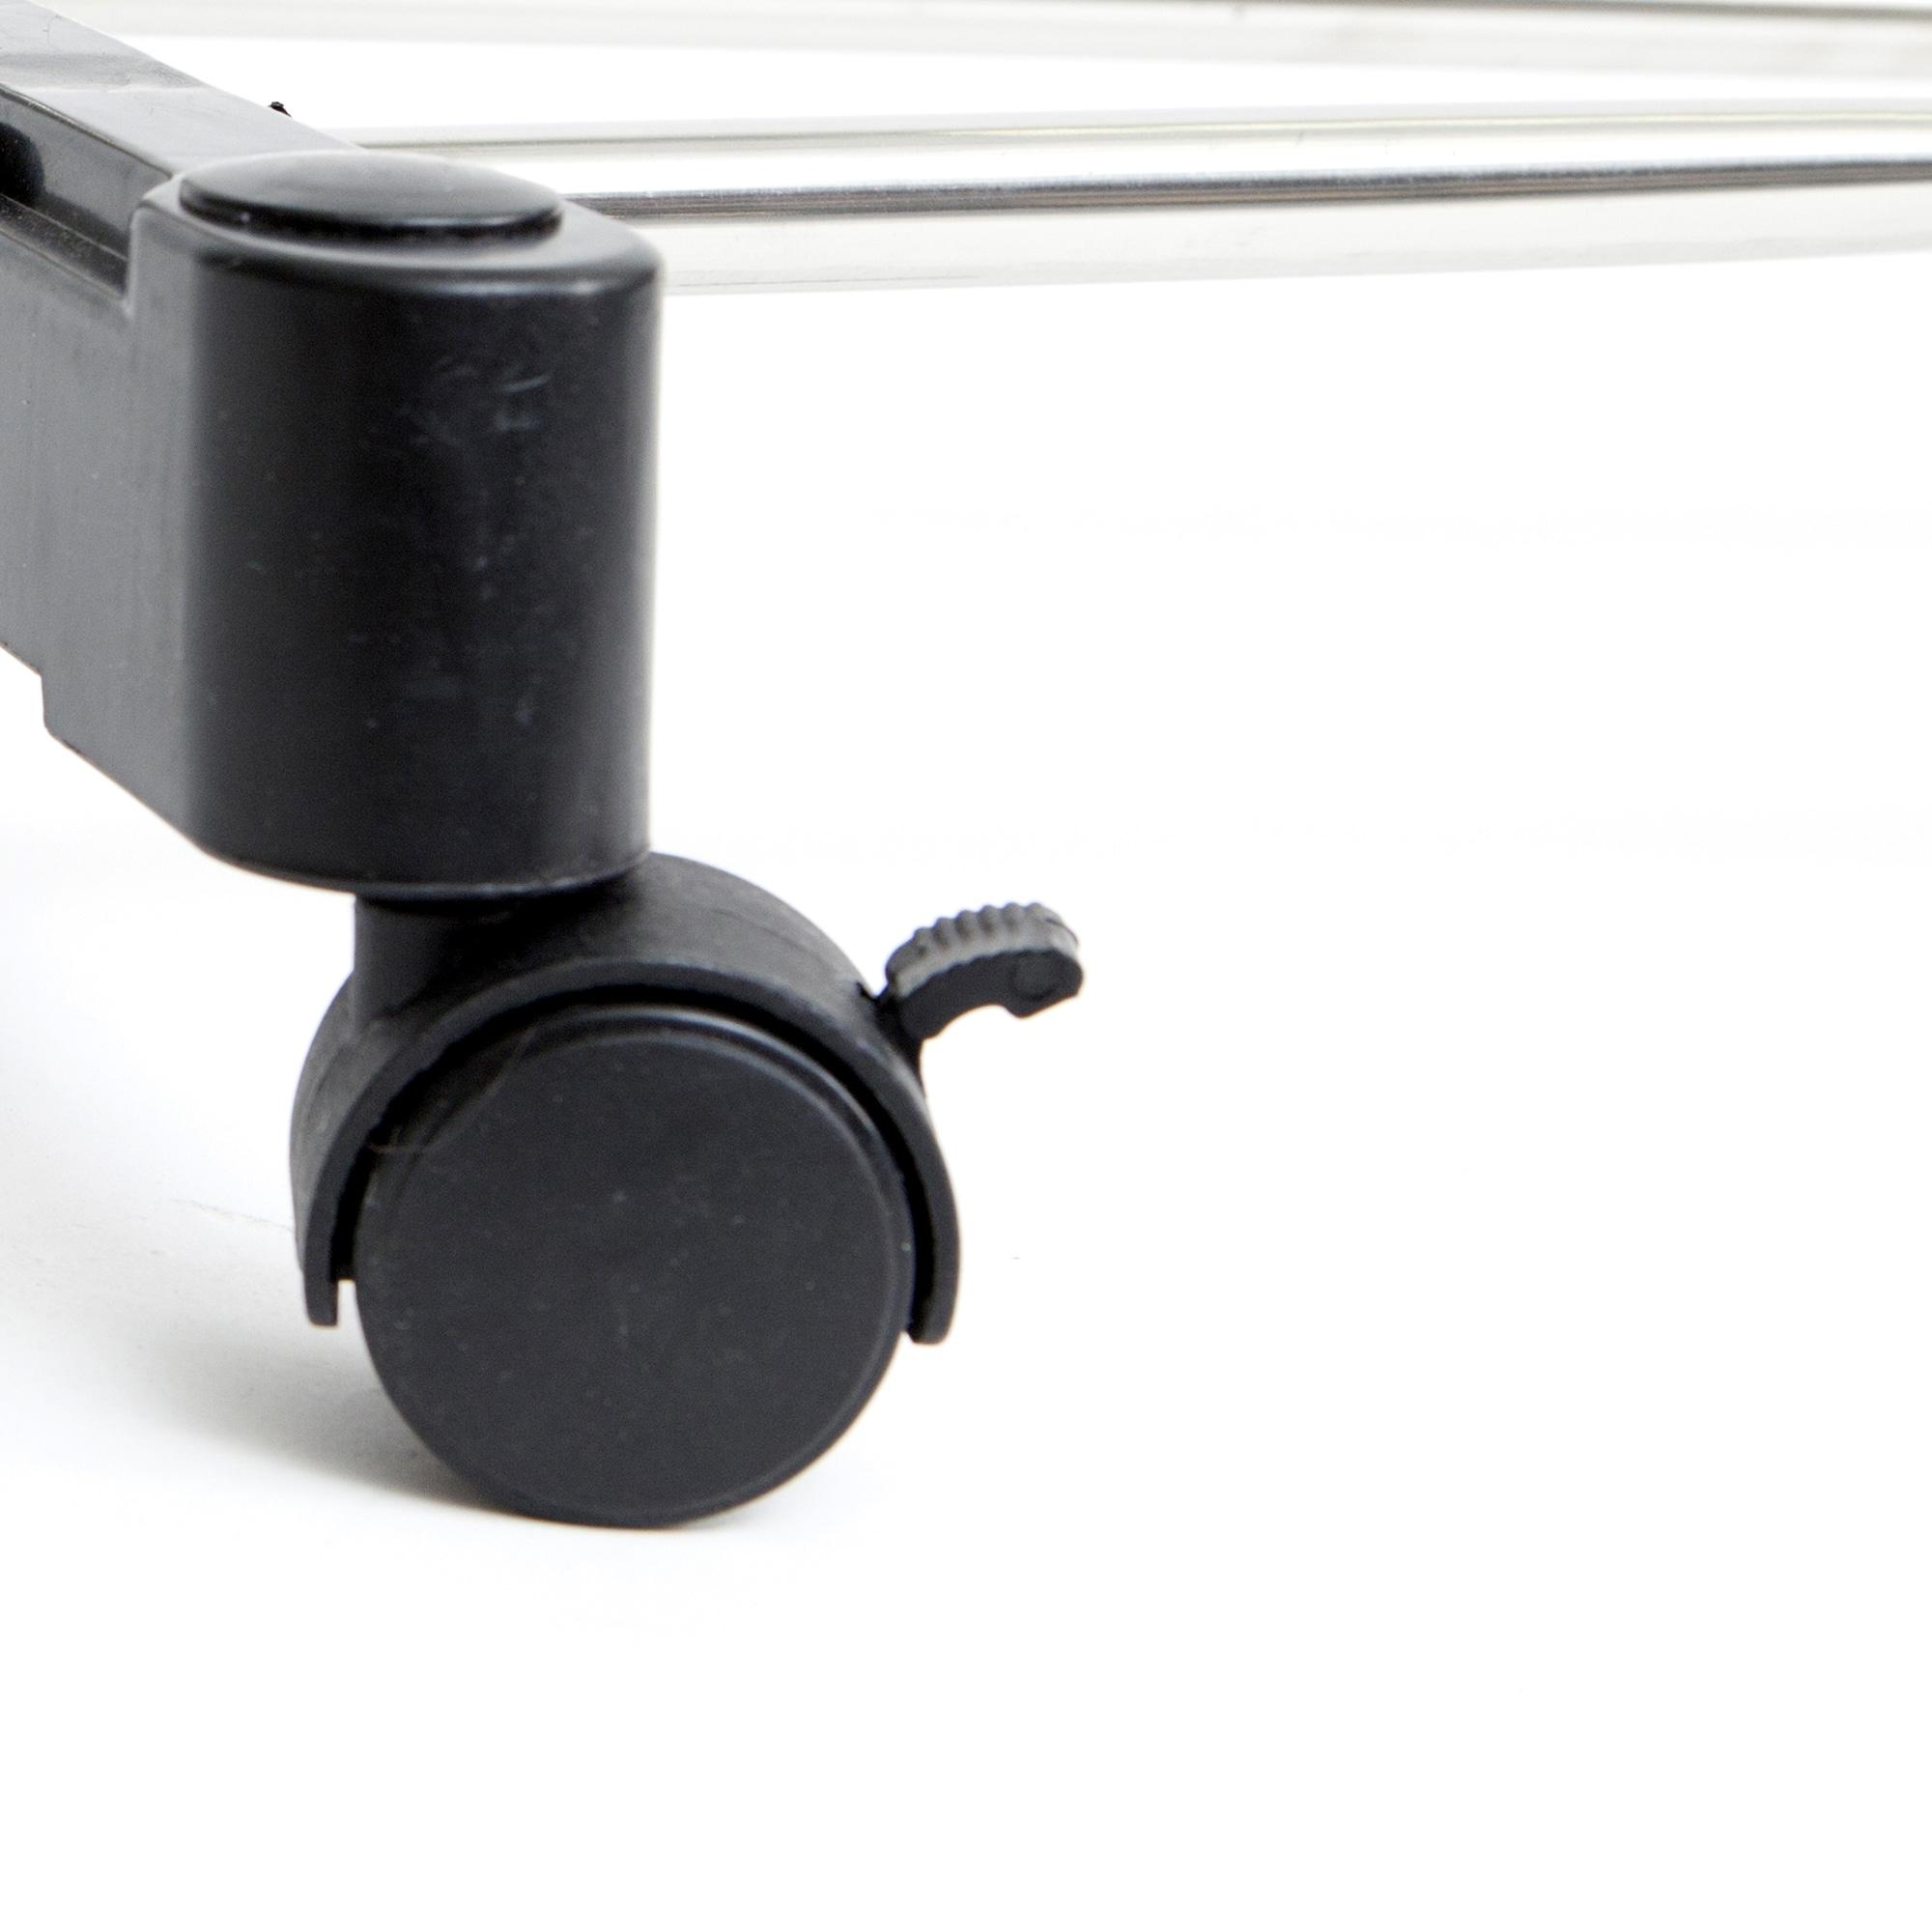 Shop Mind Reader Extend Stainless Steel Adjustable Garment Rack Chrome Finish